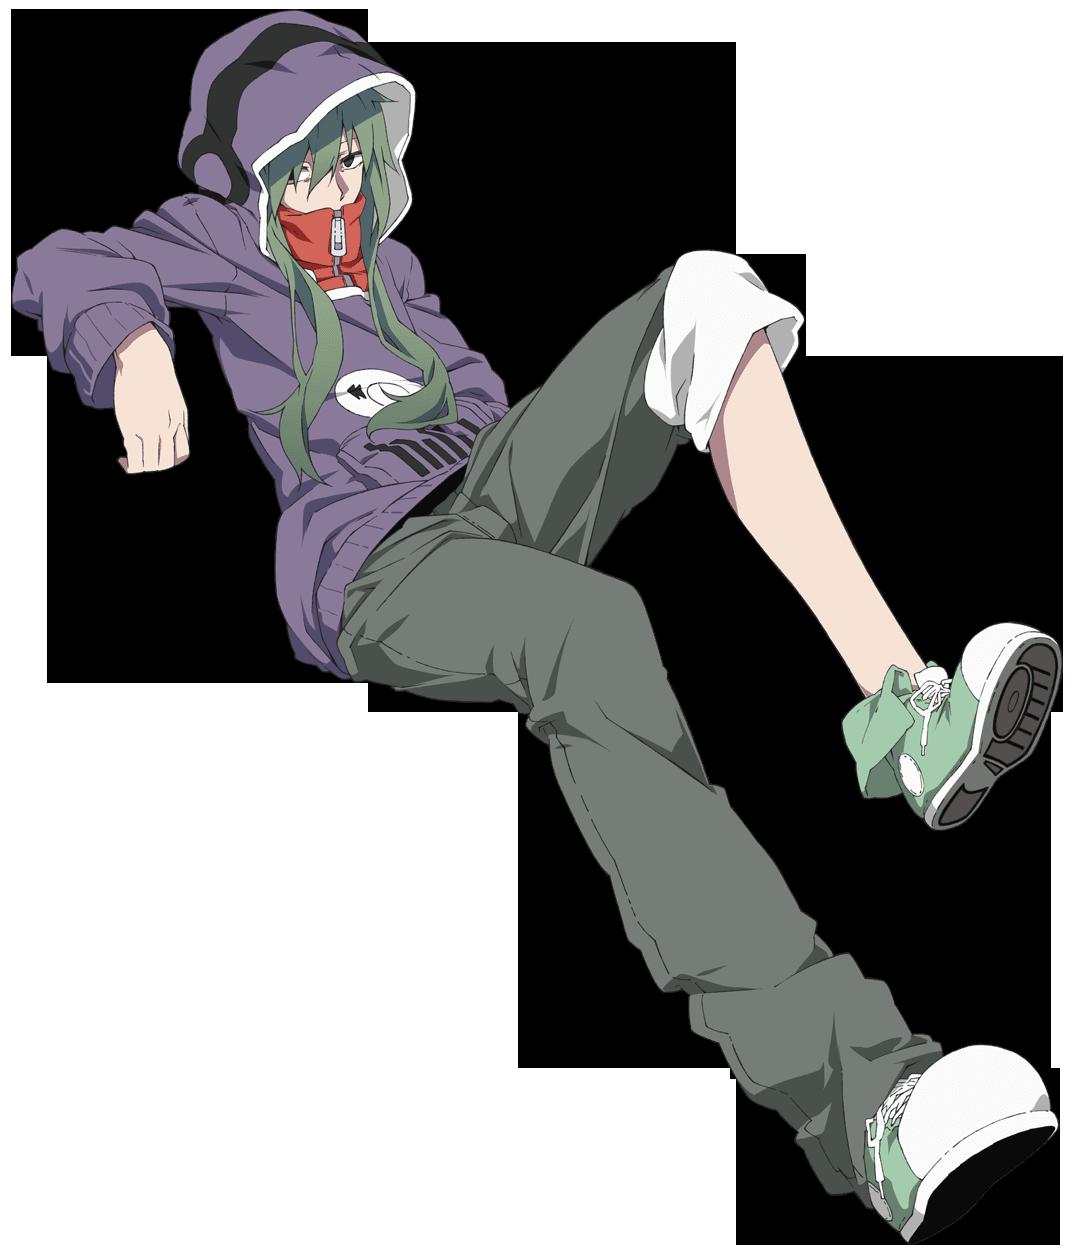 http://ami.animecharactersdatabase.com/uploads/chars/5688-1015714733.png